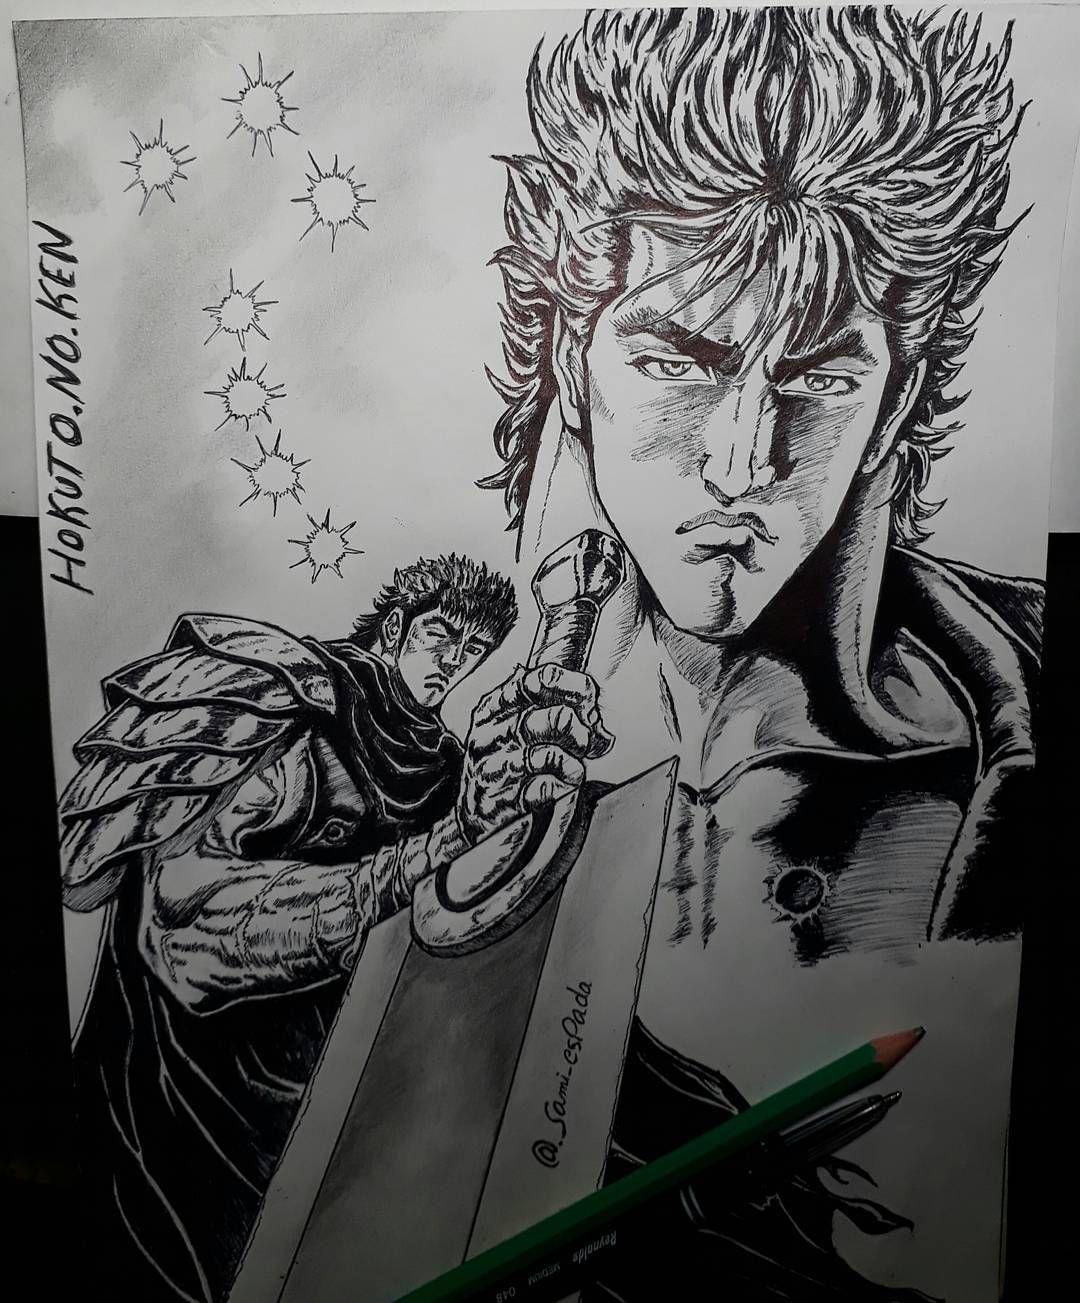 Hokuto No Ken Kenshiro Fist Of The North Star On Mode Berserk 164 Likes 22 Comments Berserk Gatsu Sami Espada On Instagram My North Star Berserk Fist